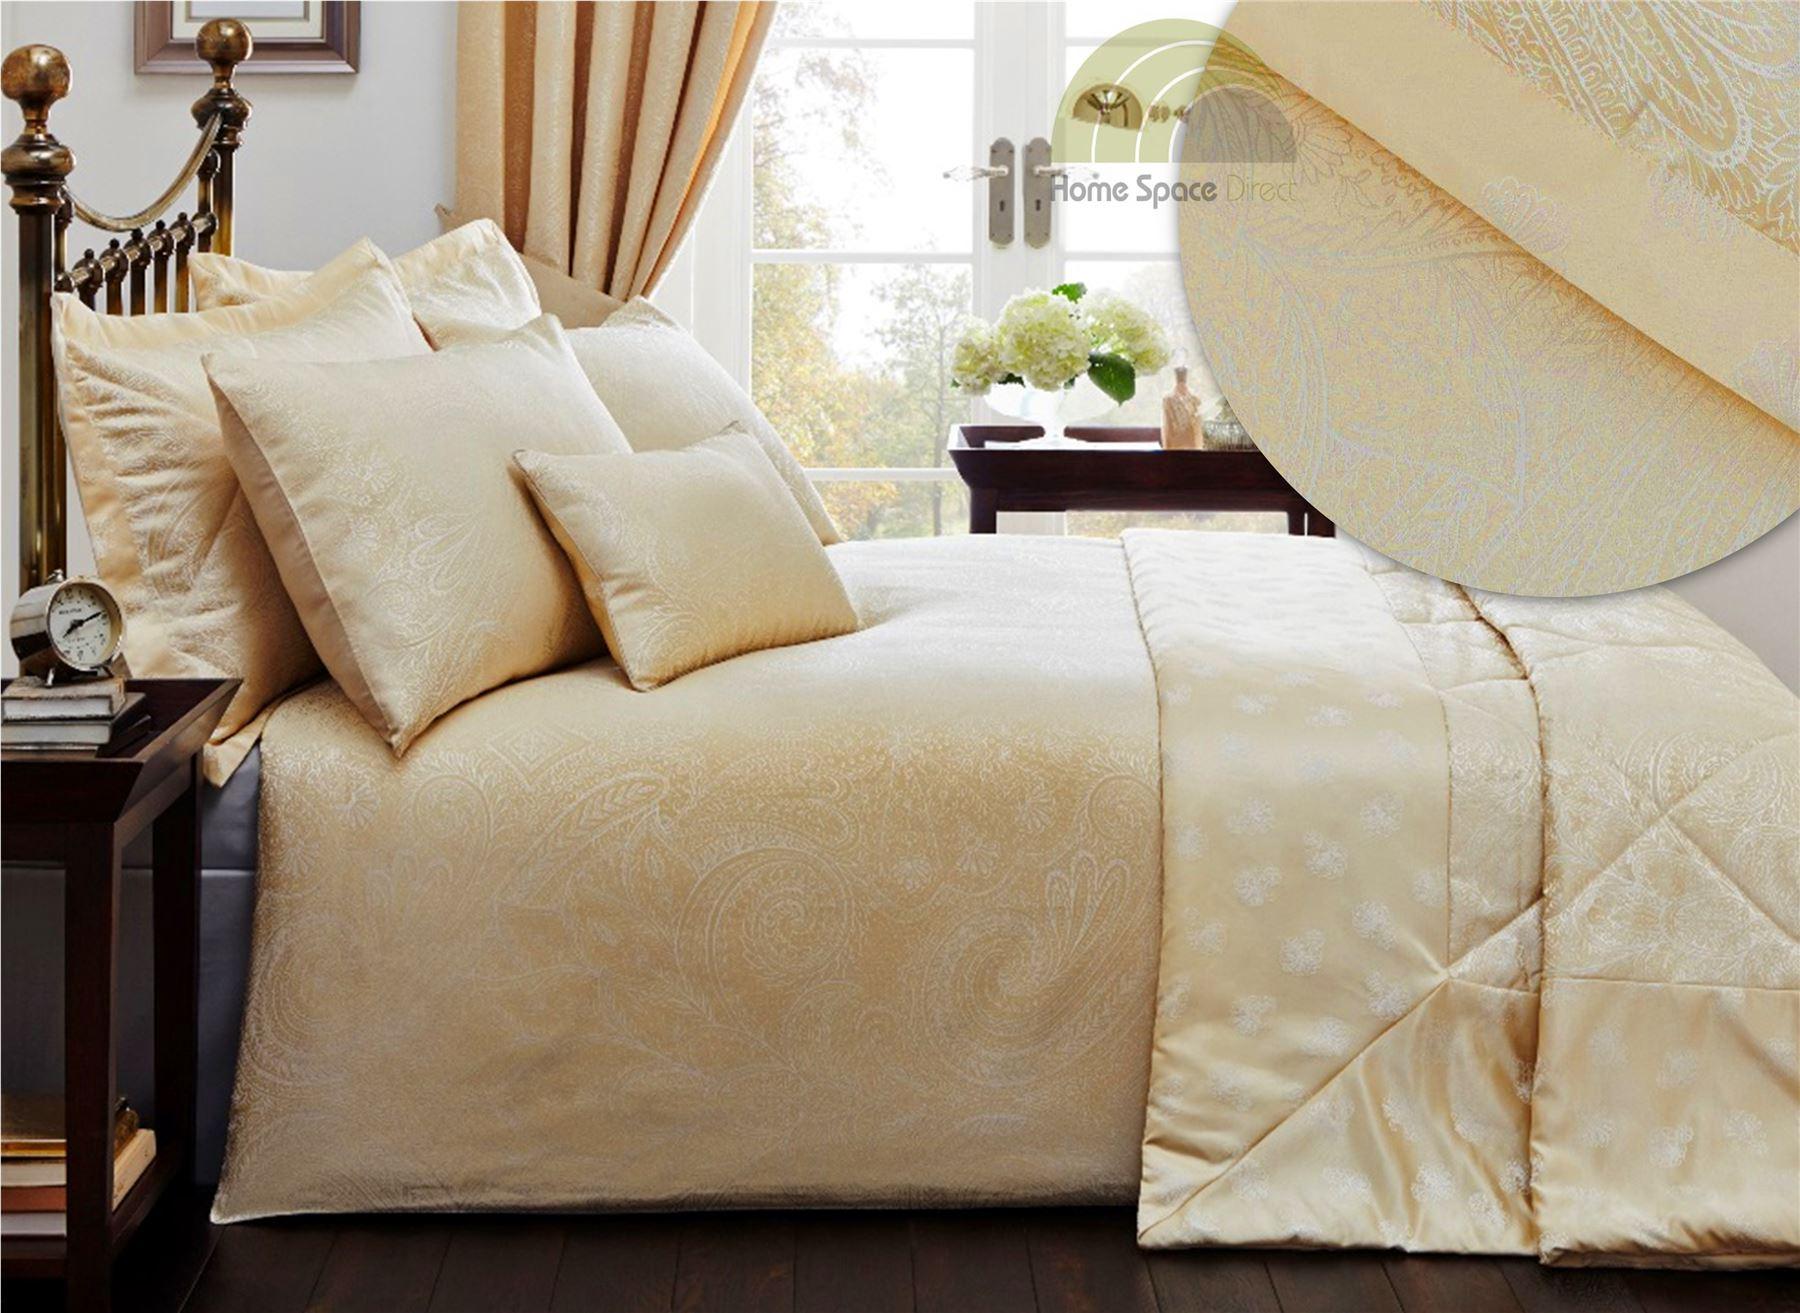 luxury quilt duvet cover pillowcase bed sets bedding 4. Black Bedroom Furniture Sets. Home Design Ideas